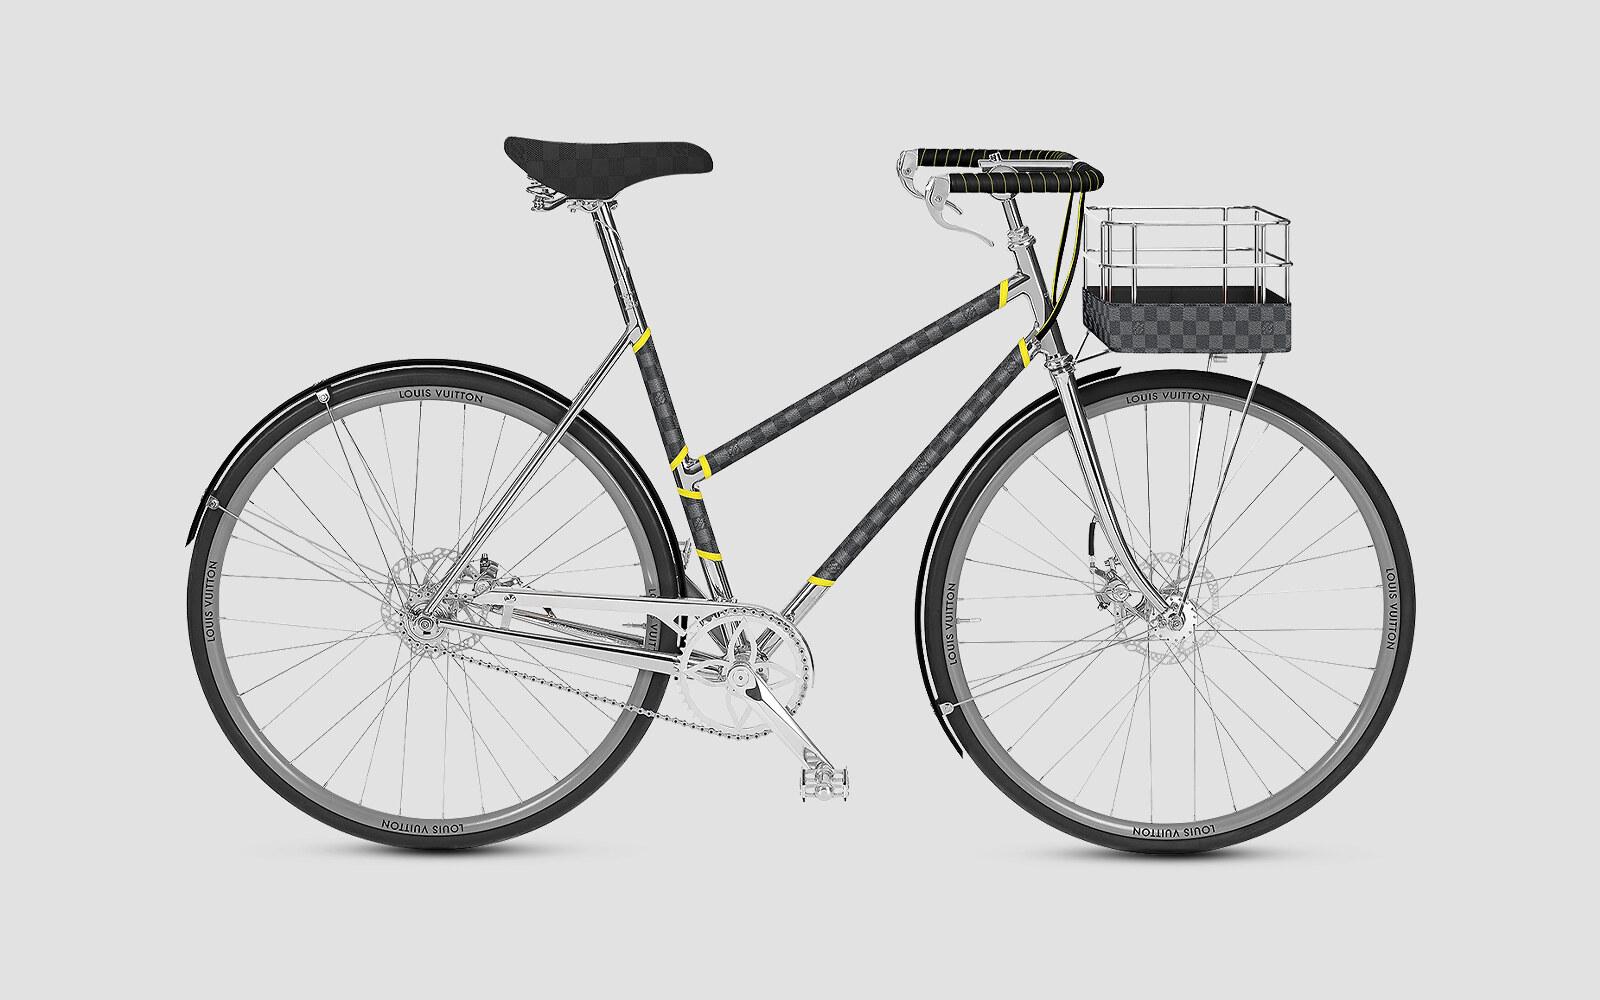 Louis Vuitton bicicletta x Maison Tamboite